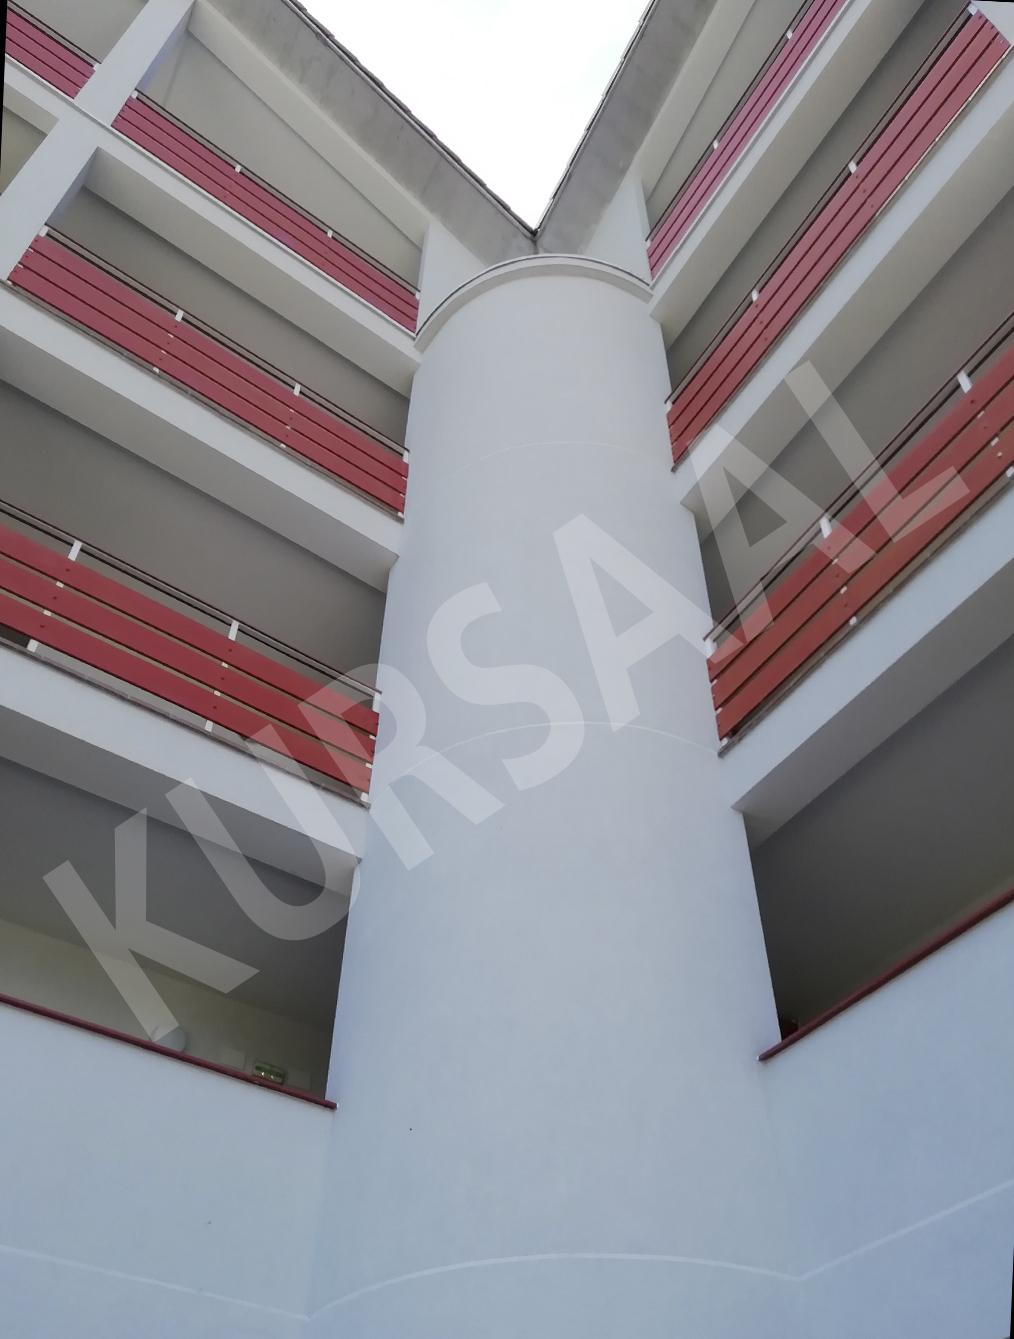 foto 14 - Aislamientos Térmicos y Eficiencia Energética-Amalkor 1-ADUNA- GIPUZKOA